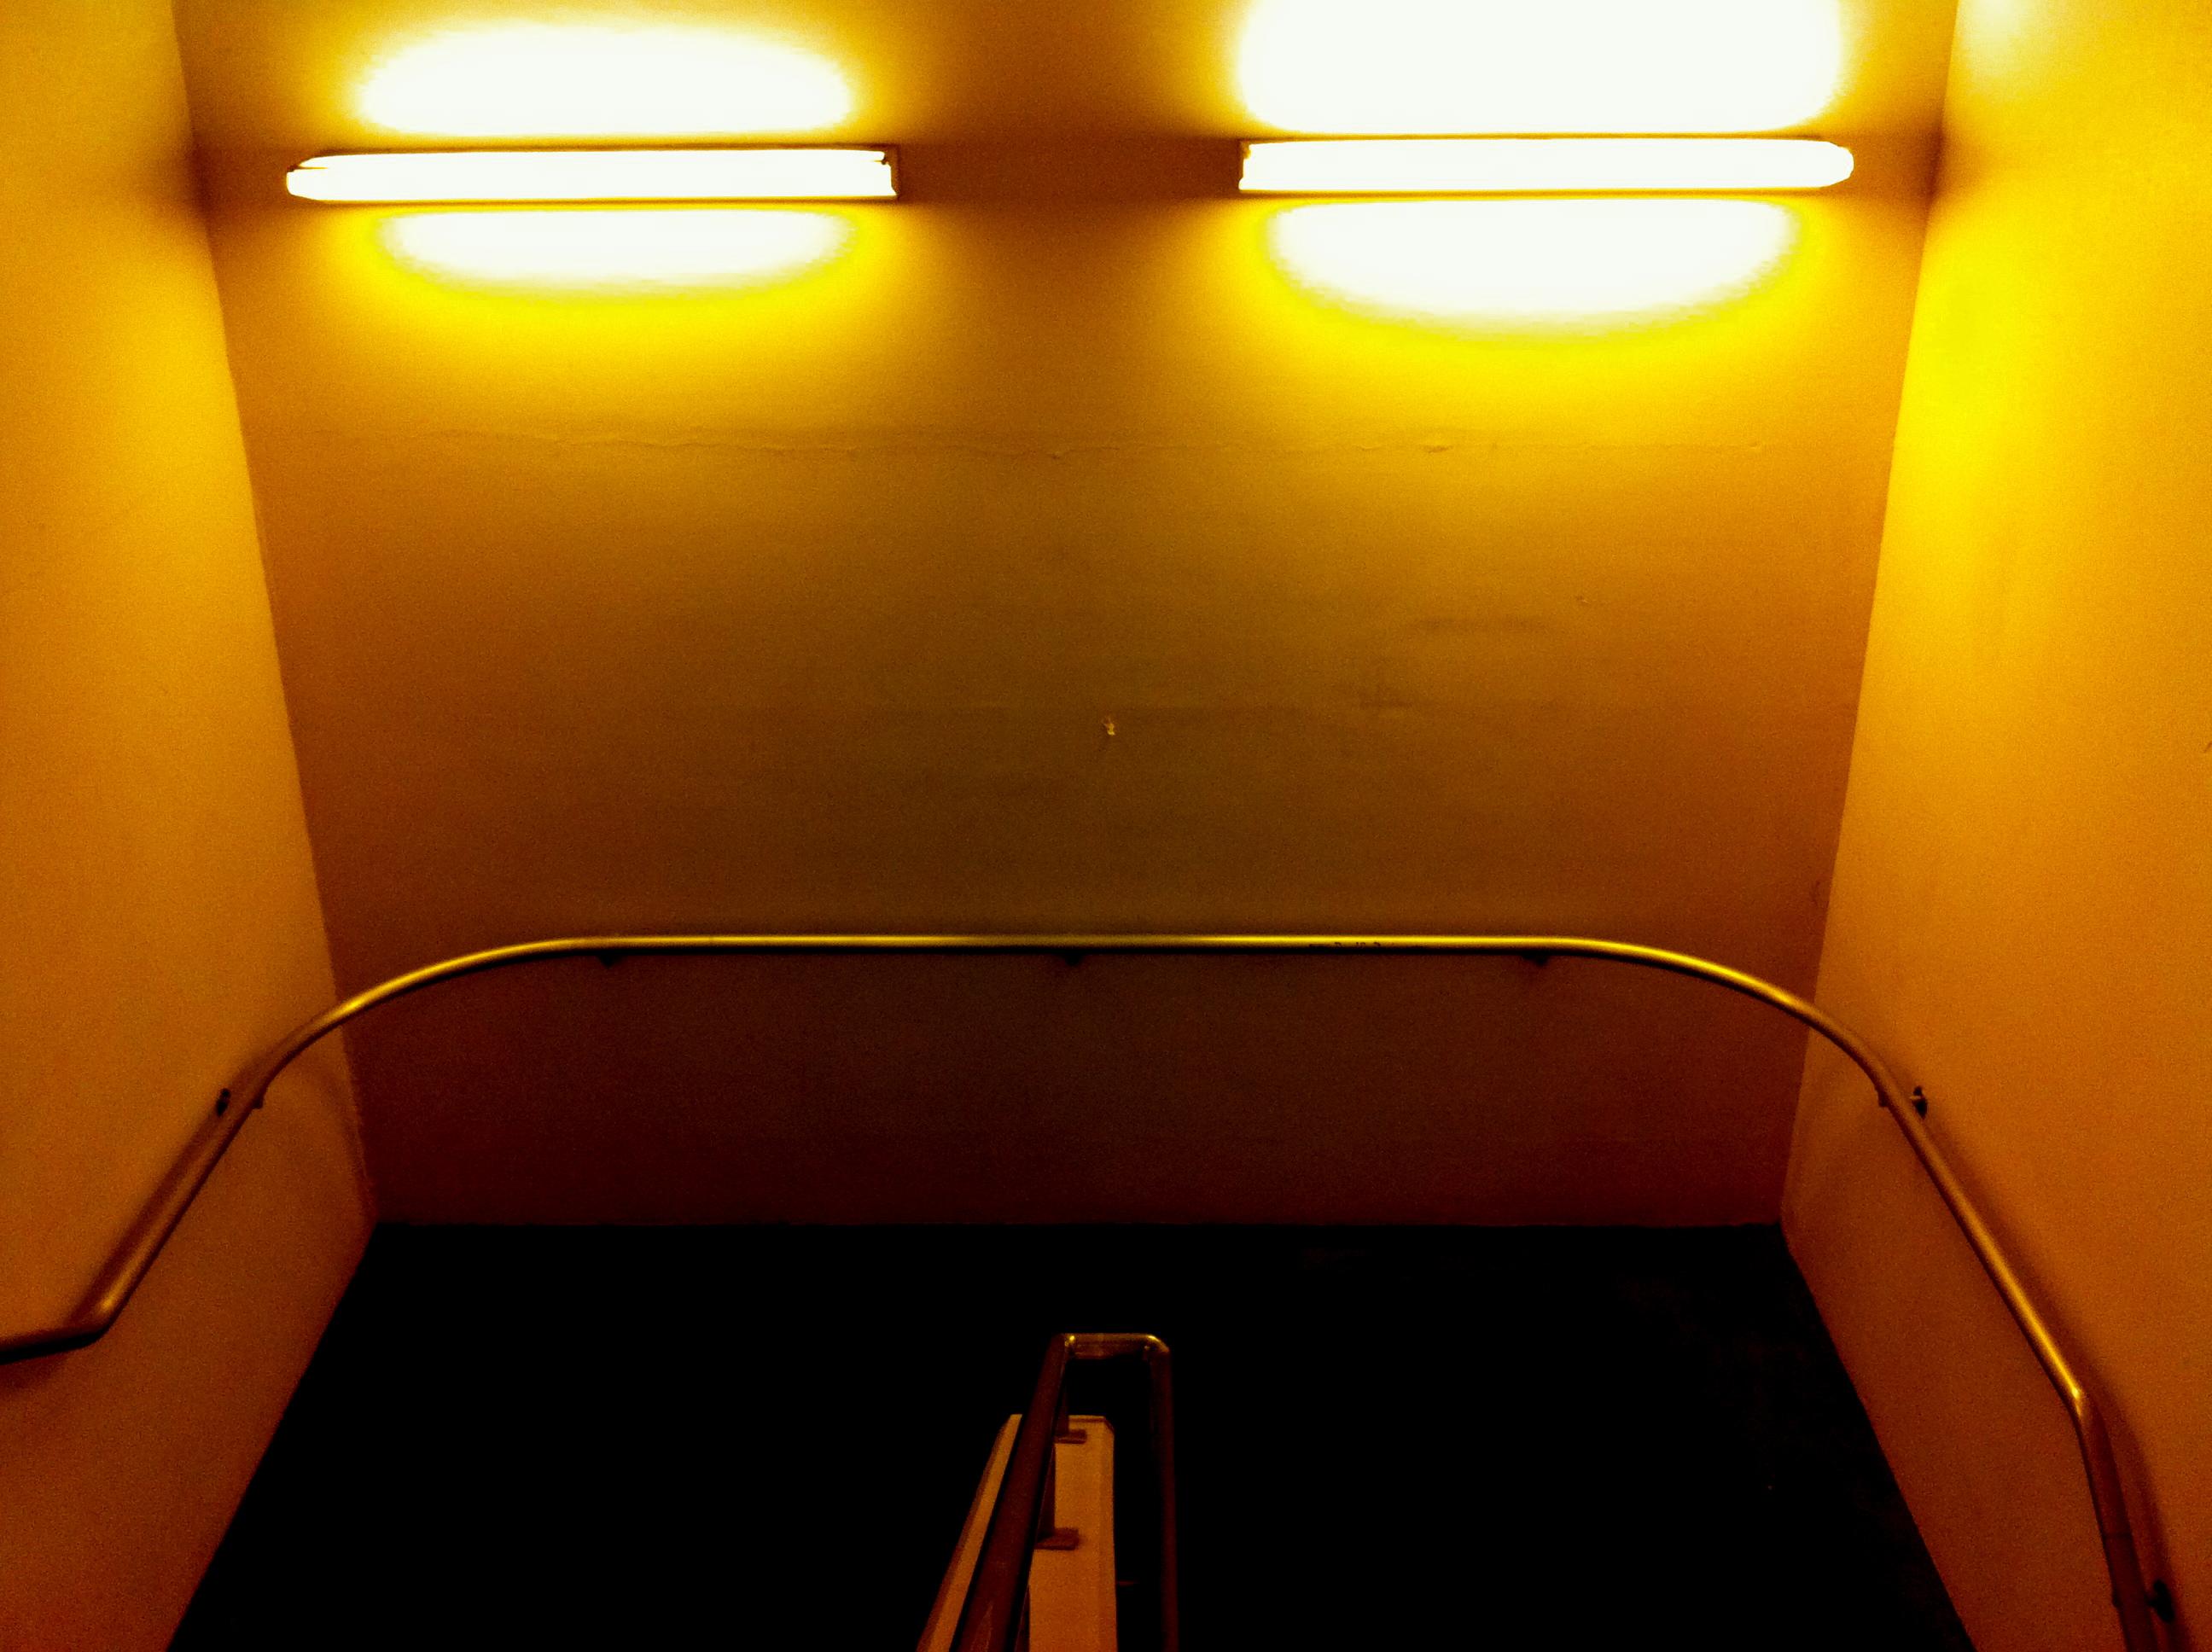 Angry Light, Angry, Contrast, Dark, Lights, HQ Photo